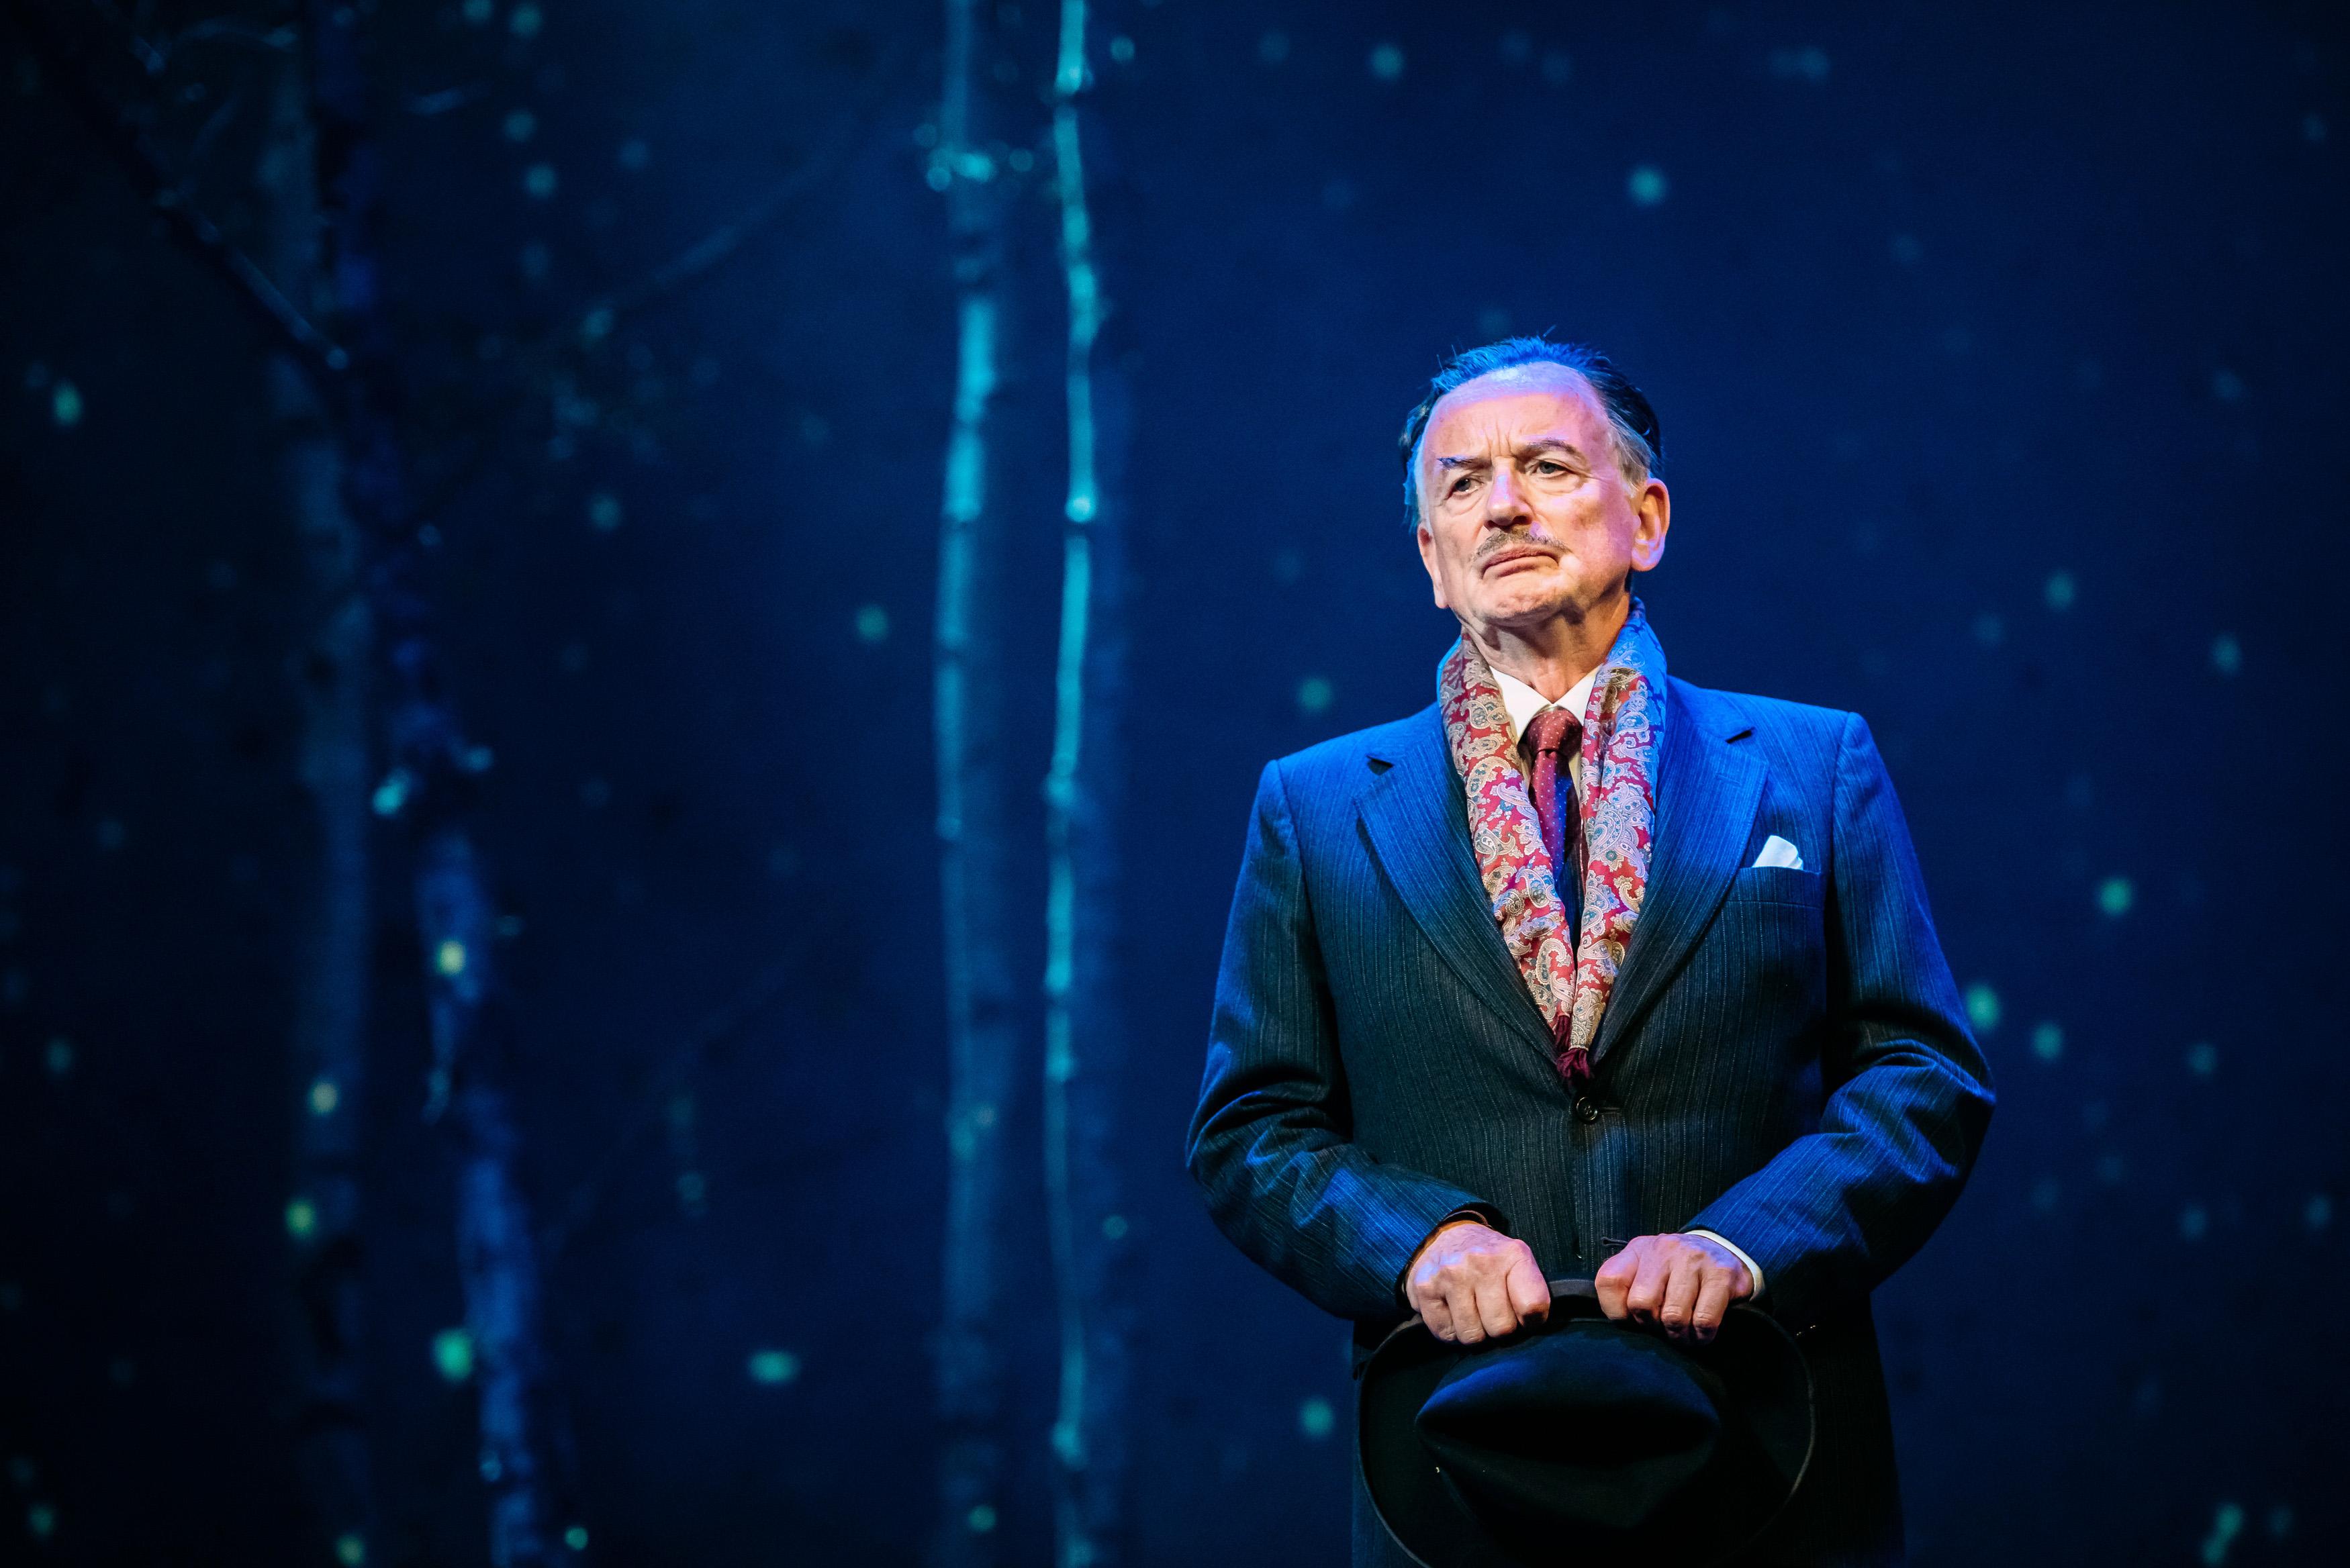 BWW Review: WHAT SHADOWS, Park Theatre